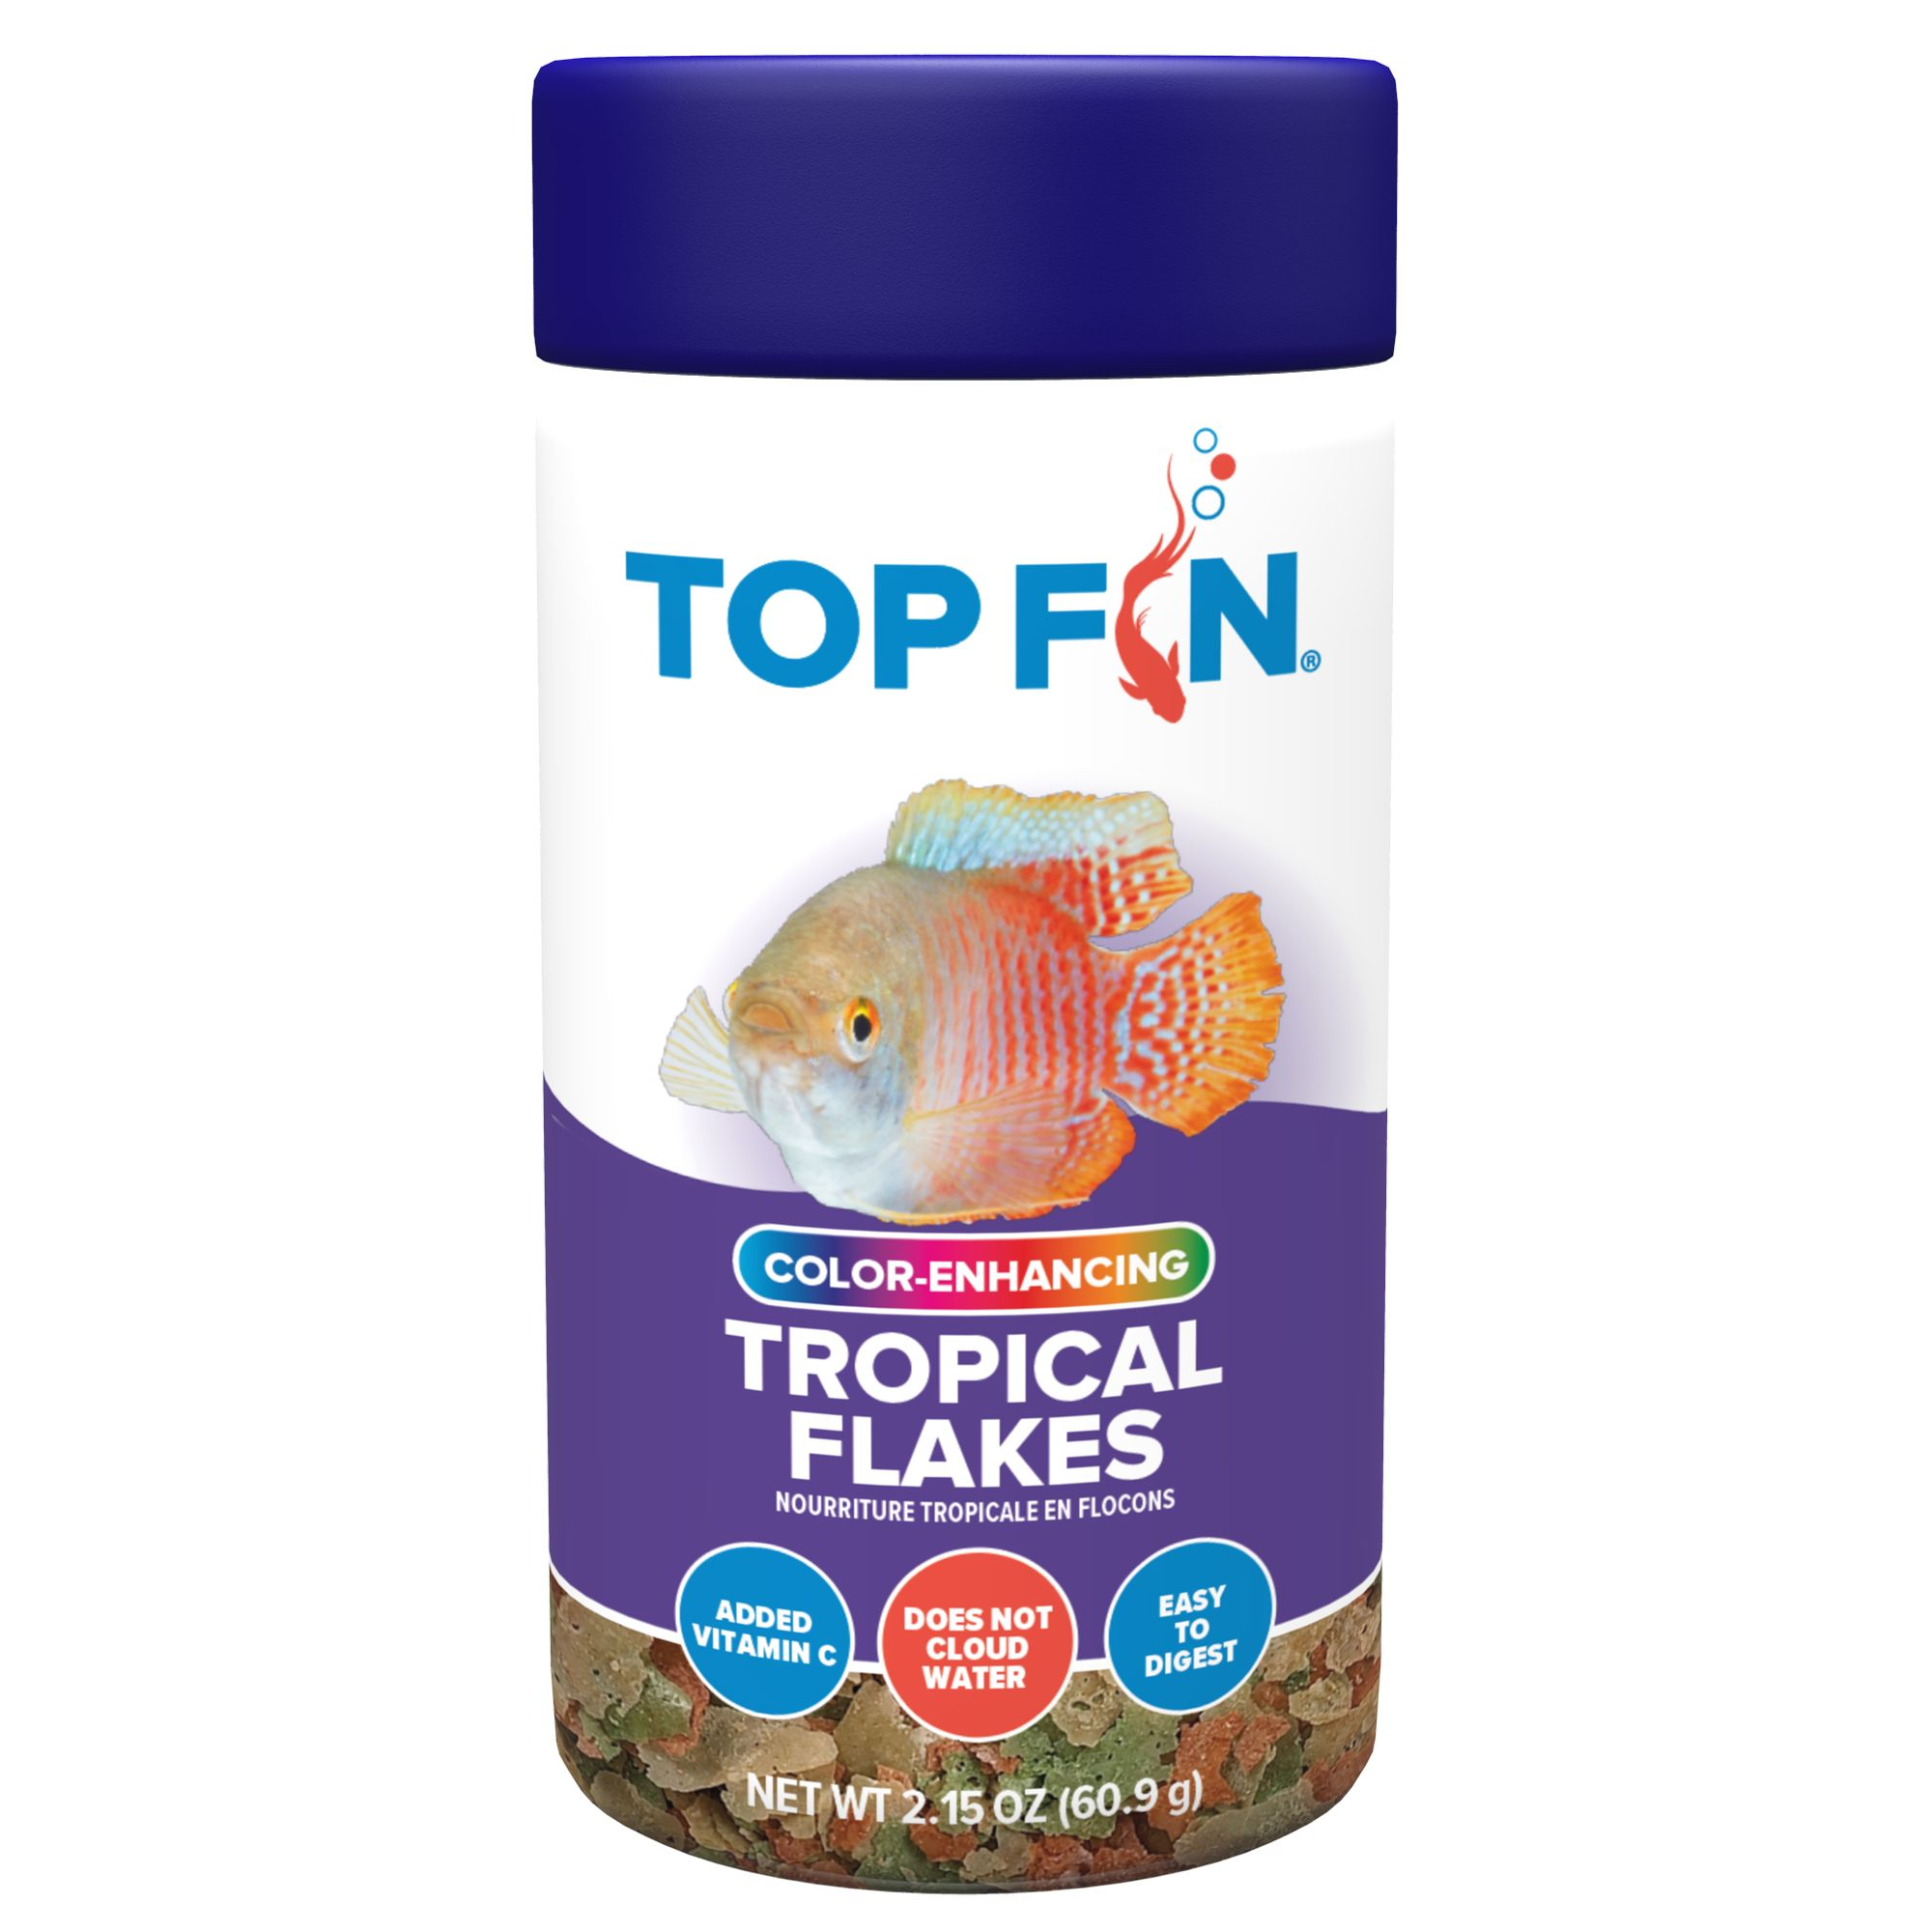 Top Fin Tropical Fish Flakes Fish Food Petsmart